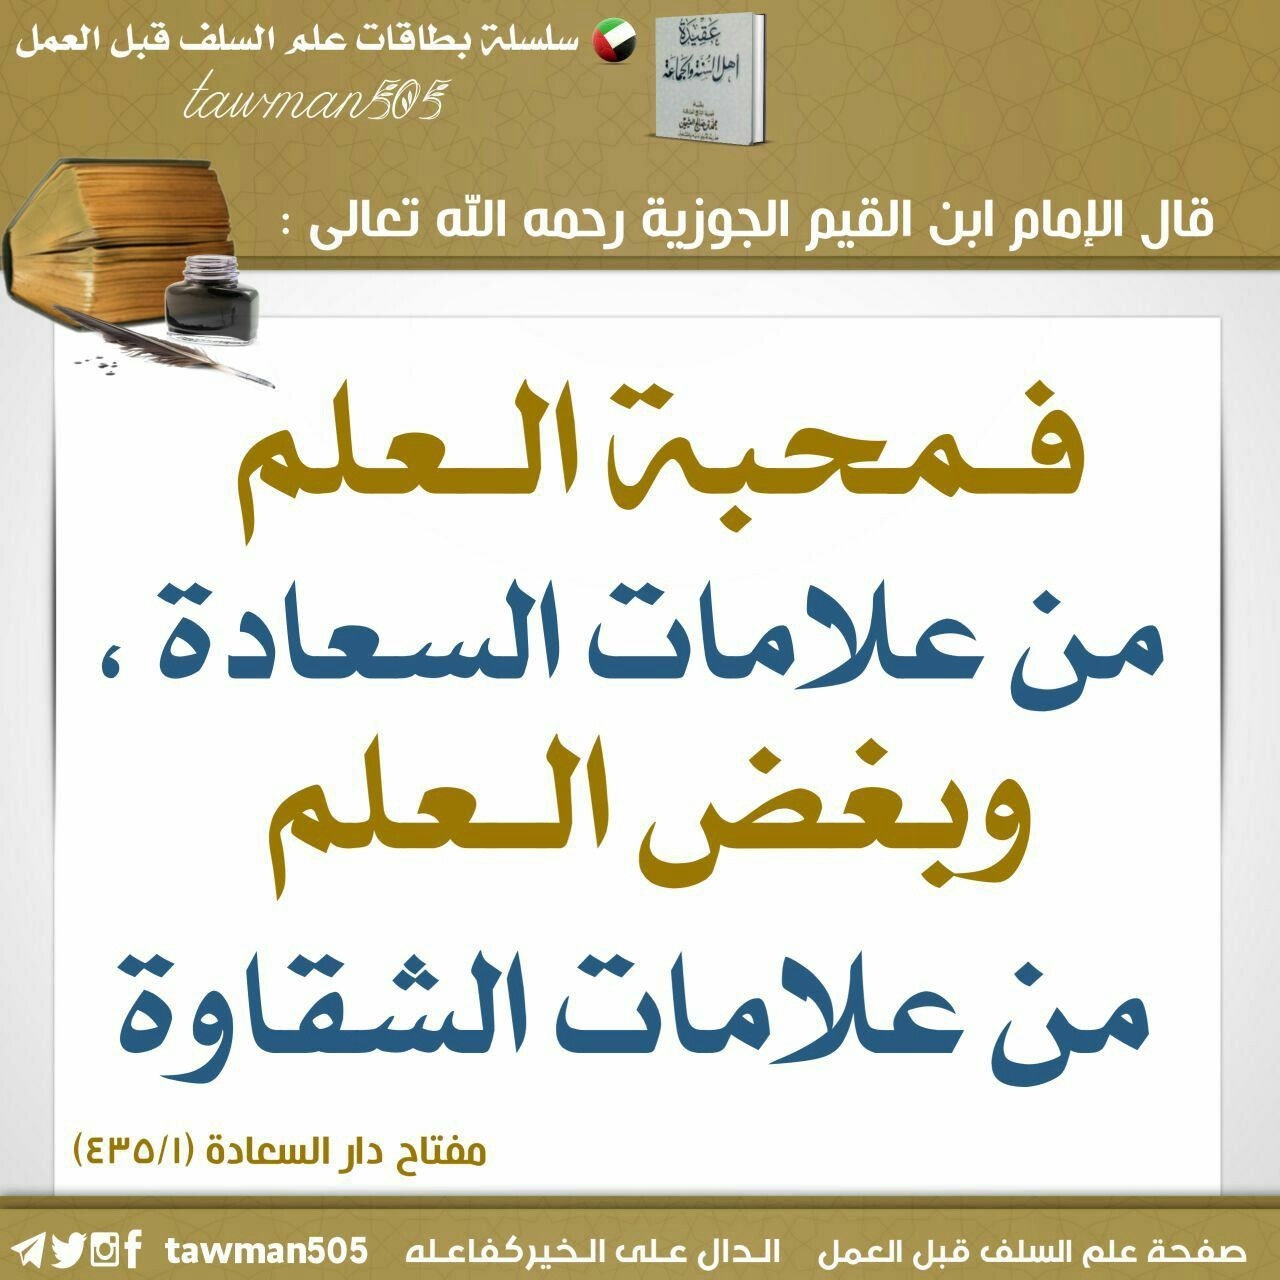 Pin By زهرة الياسمين On طلب العلم